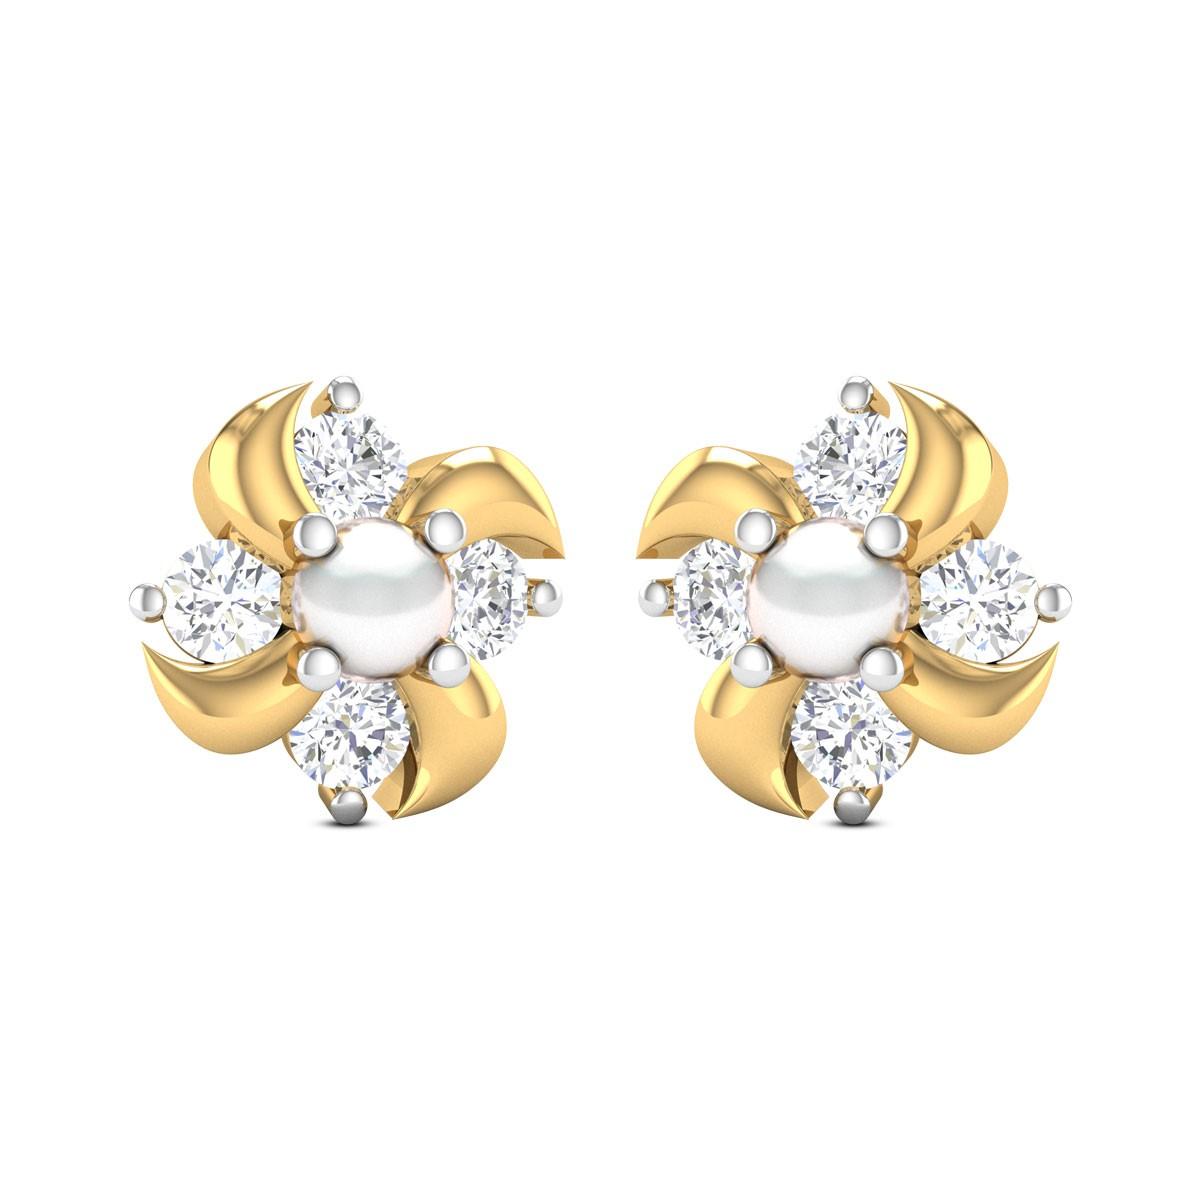 Iona Stud Earrings